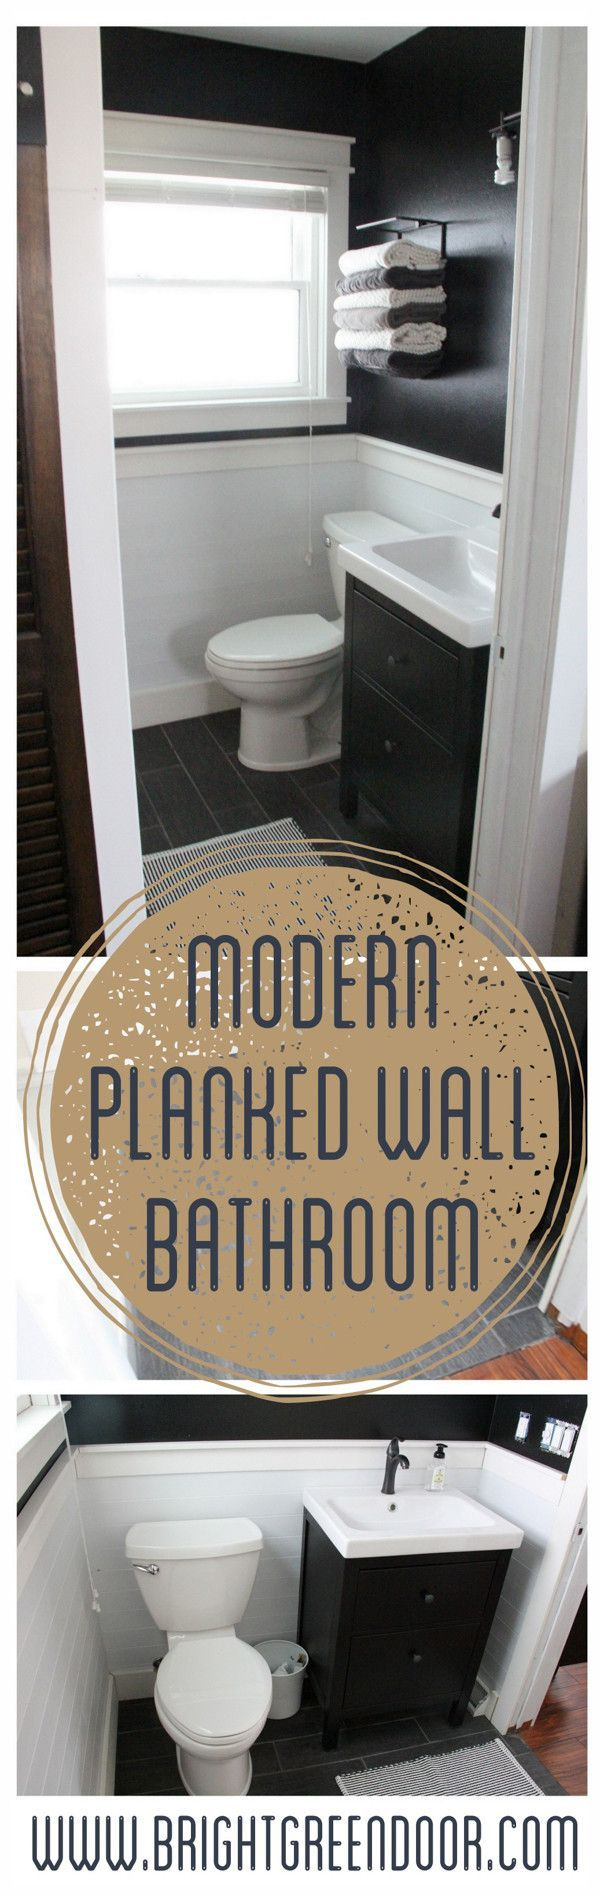 Black and Planked Modern Bathroom Walls www.BrightGreenDoor.com